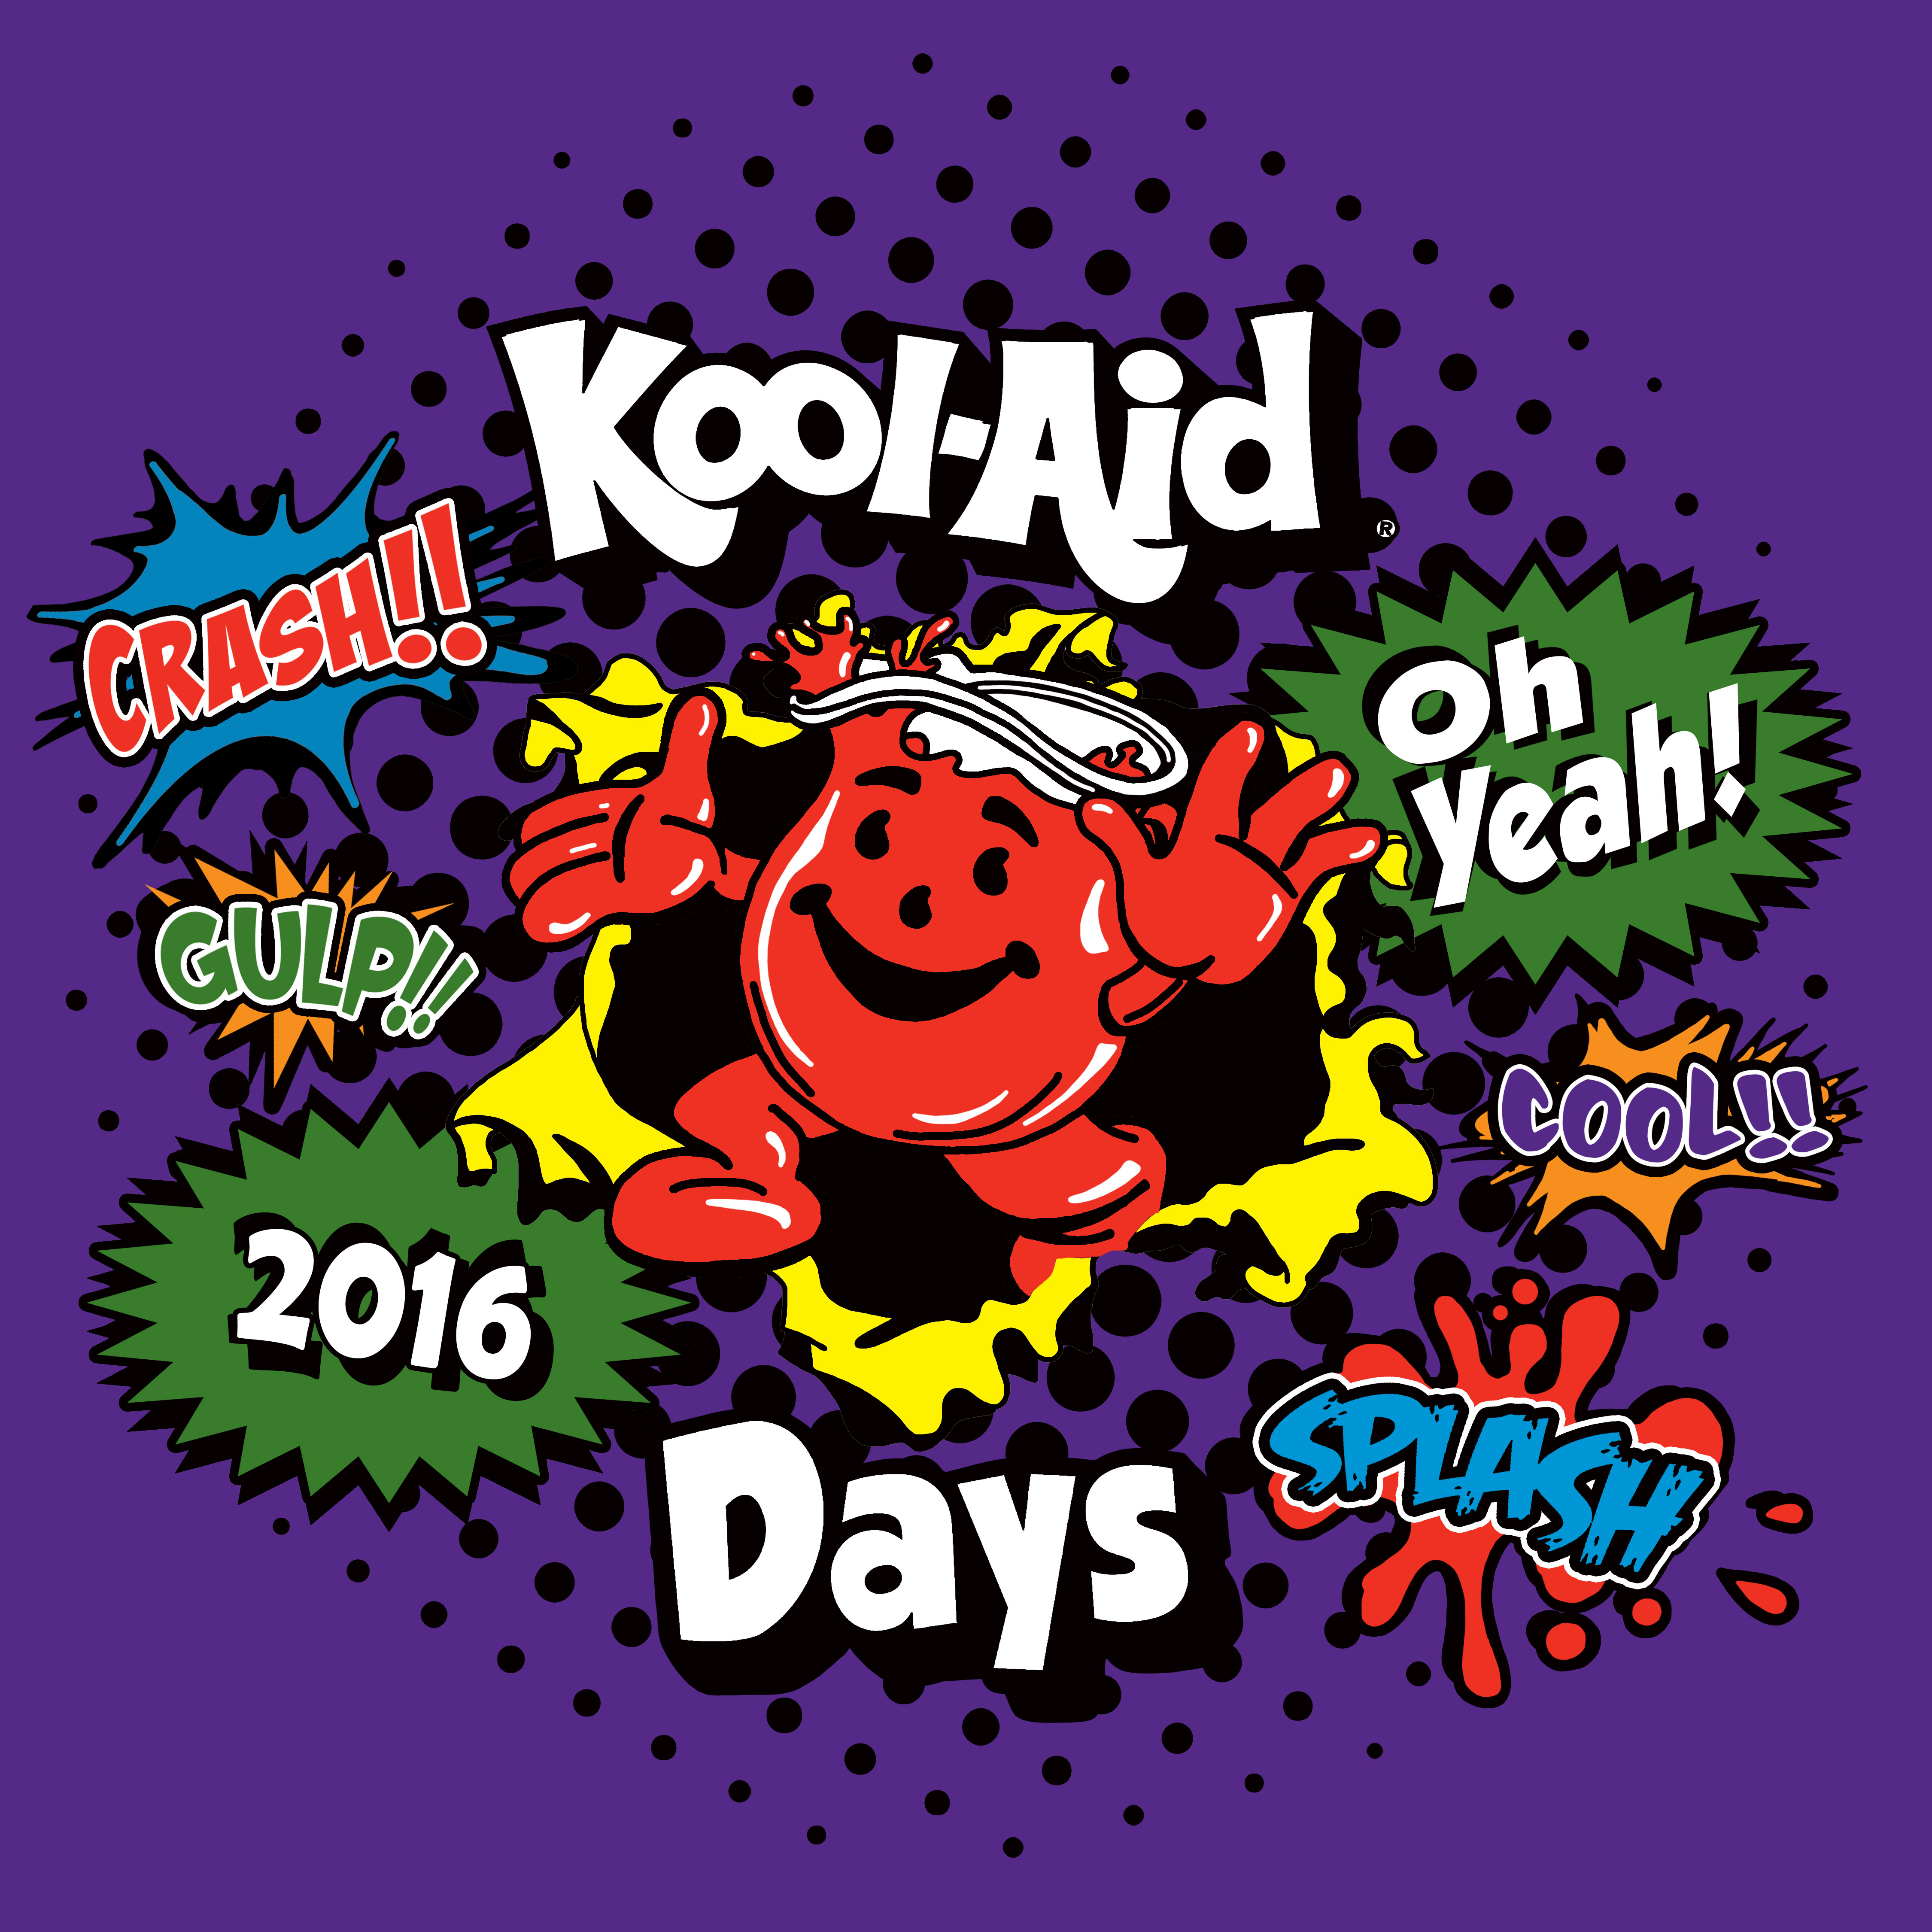 Images of Kool-Aid   4500x4500